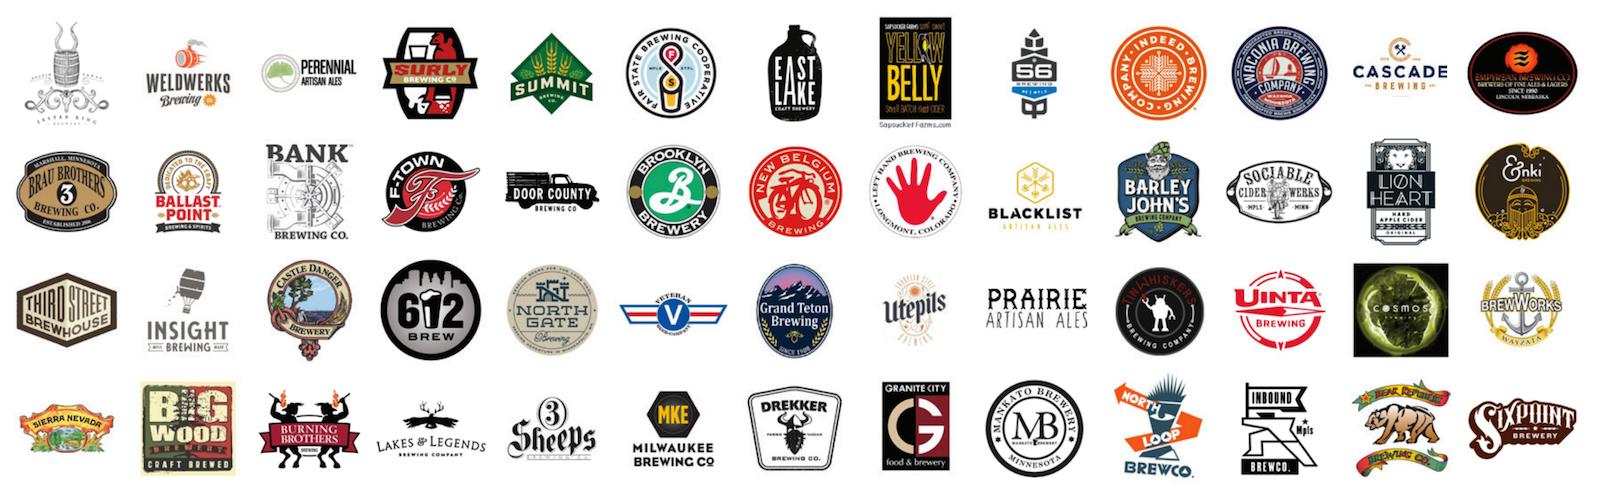 Minnesota craft beer festival 2017 tickets sat apr 1 for Minnesota craft beer festival